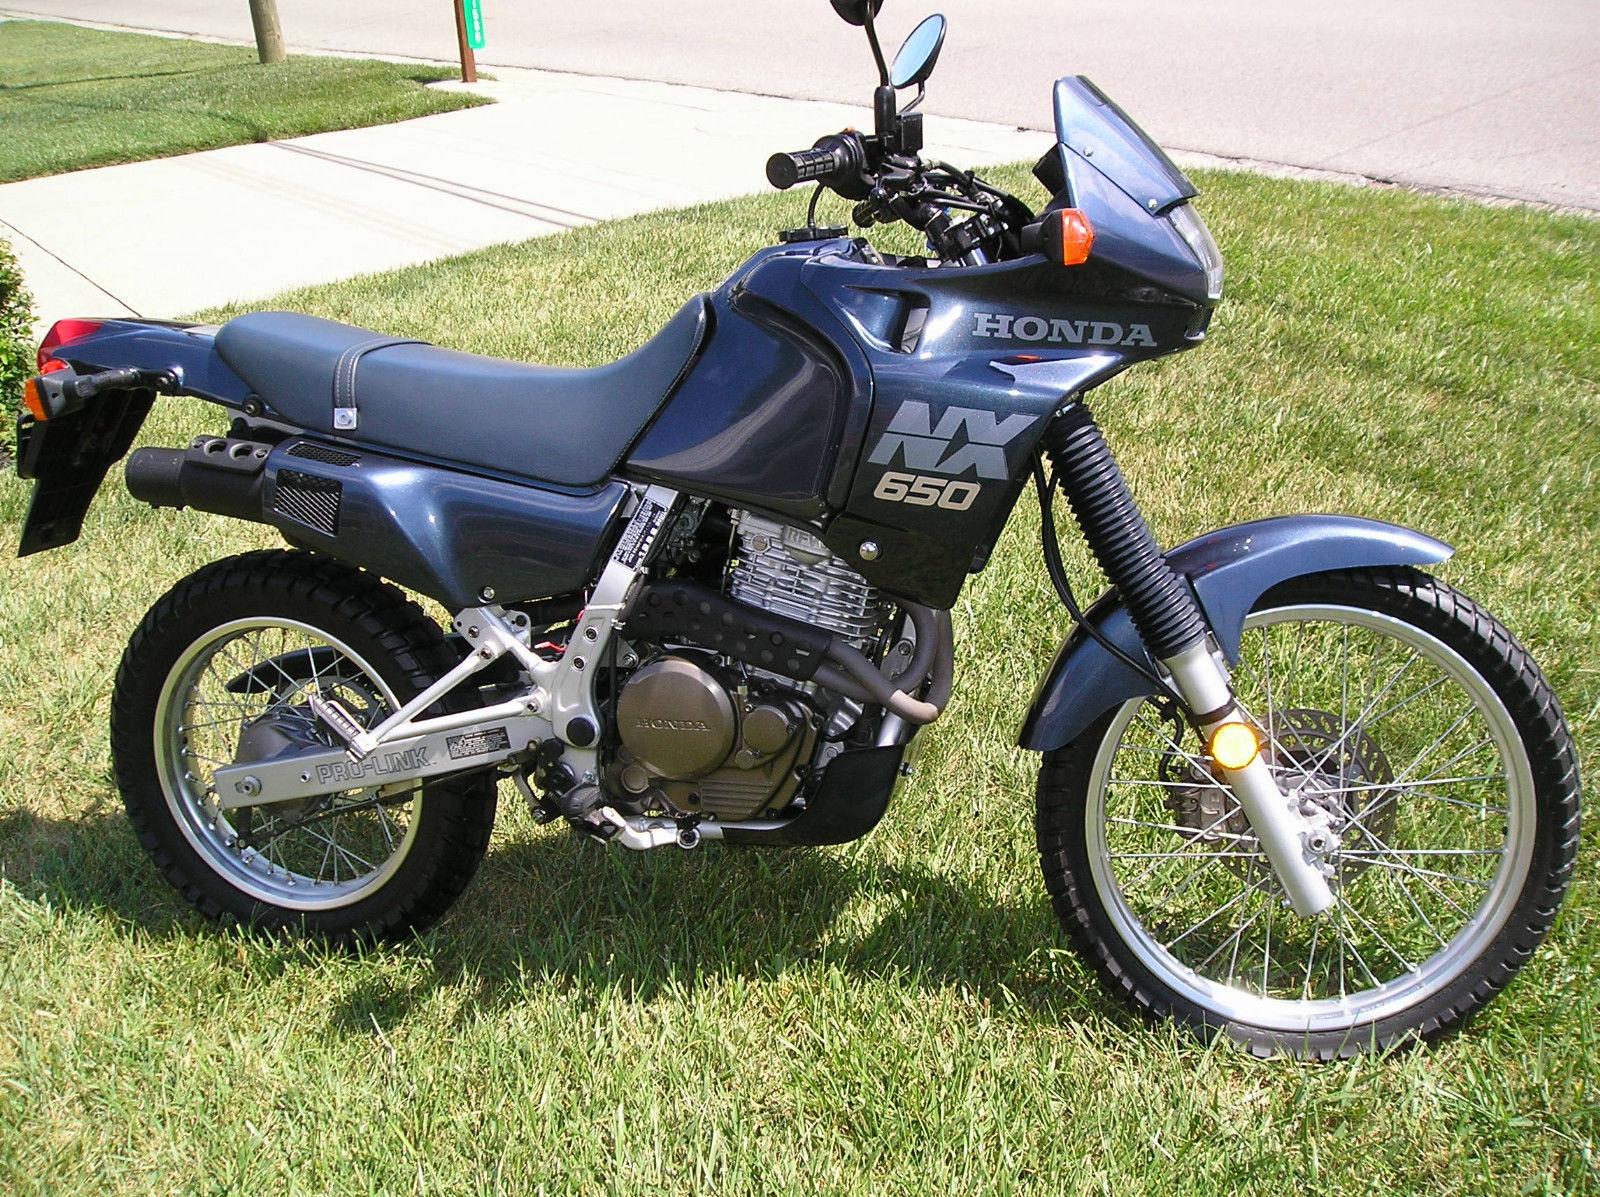 1988 honda nx650 for sale